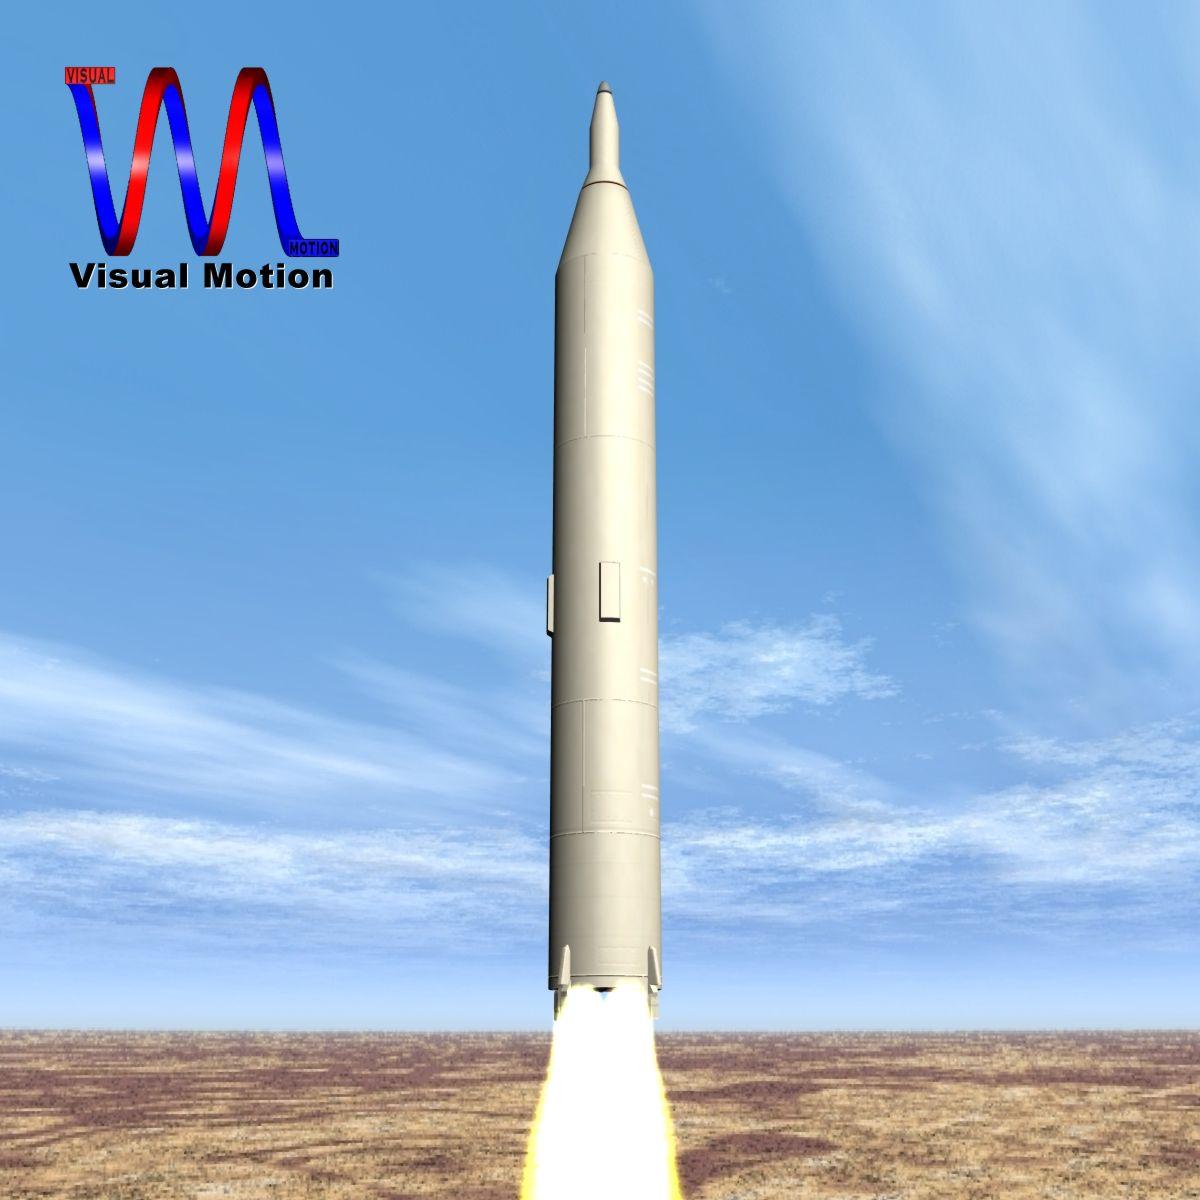 iranian simorgh missile concept 1 3d model 3ds dxf cob x obj 158264